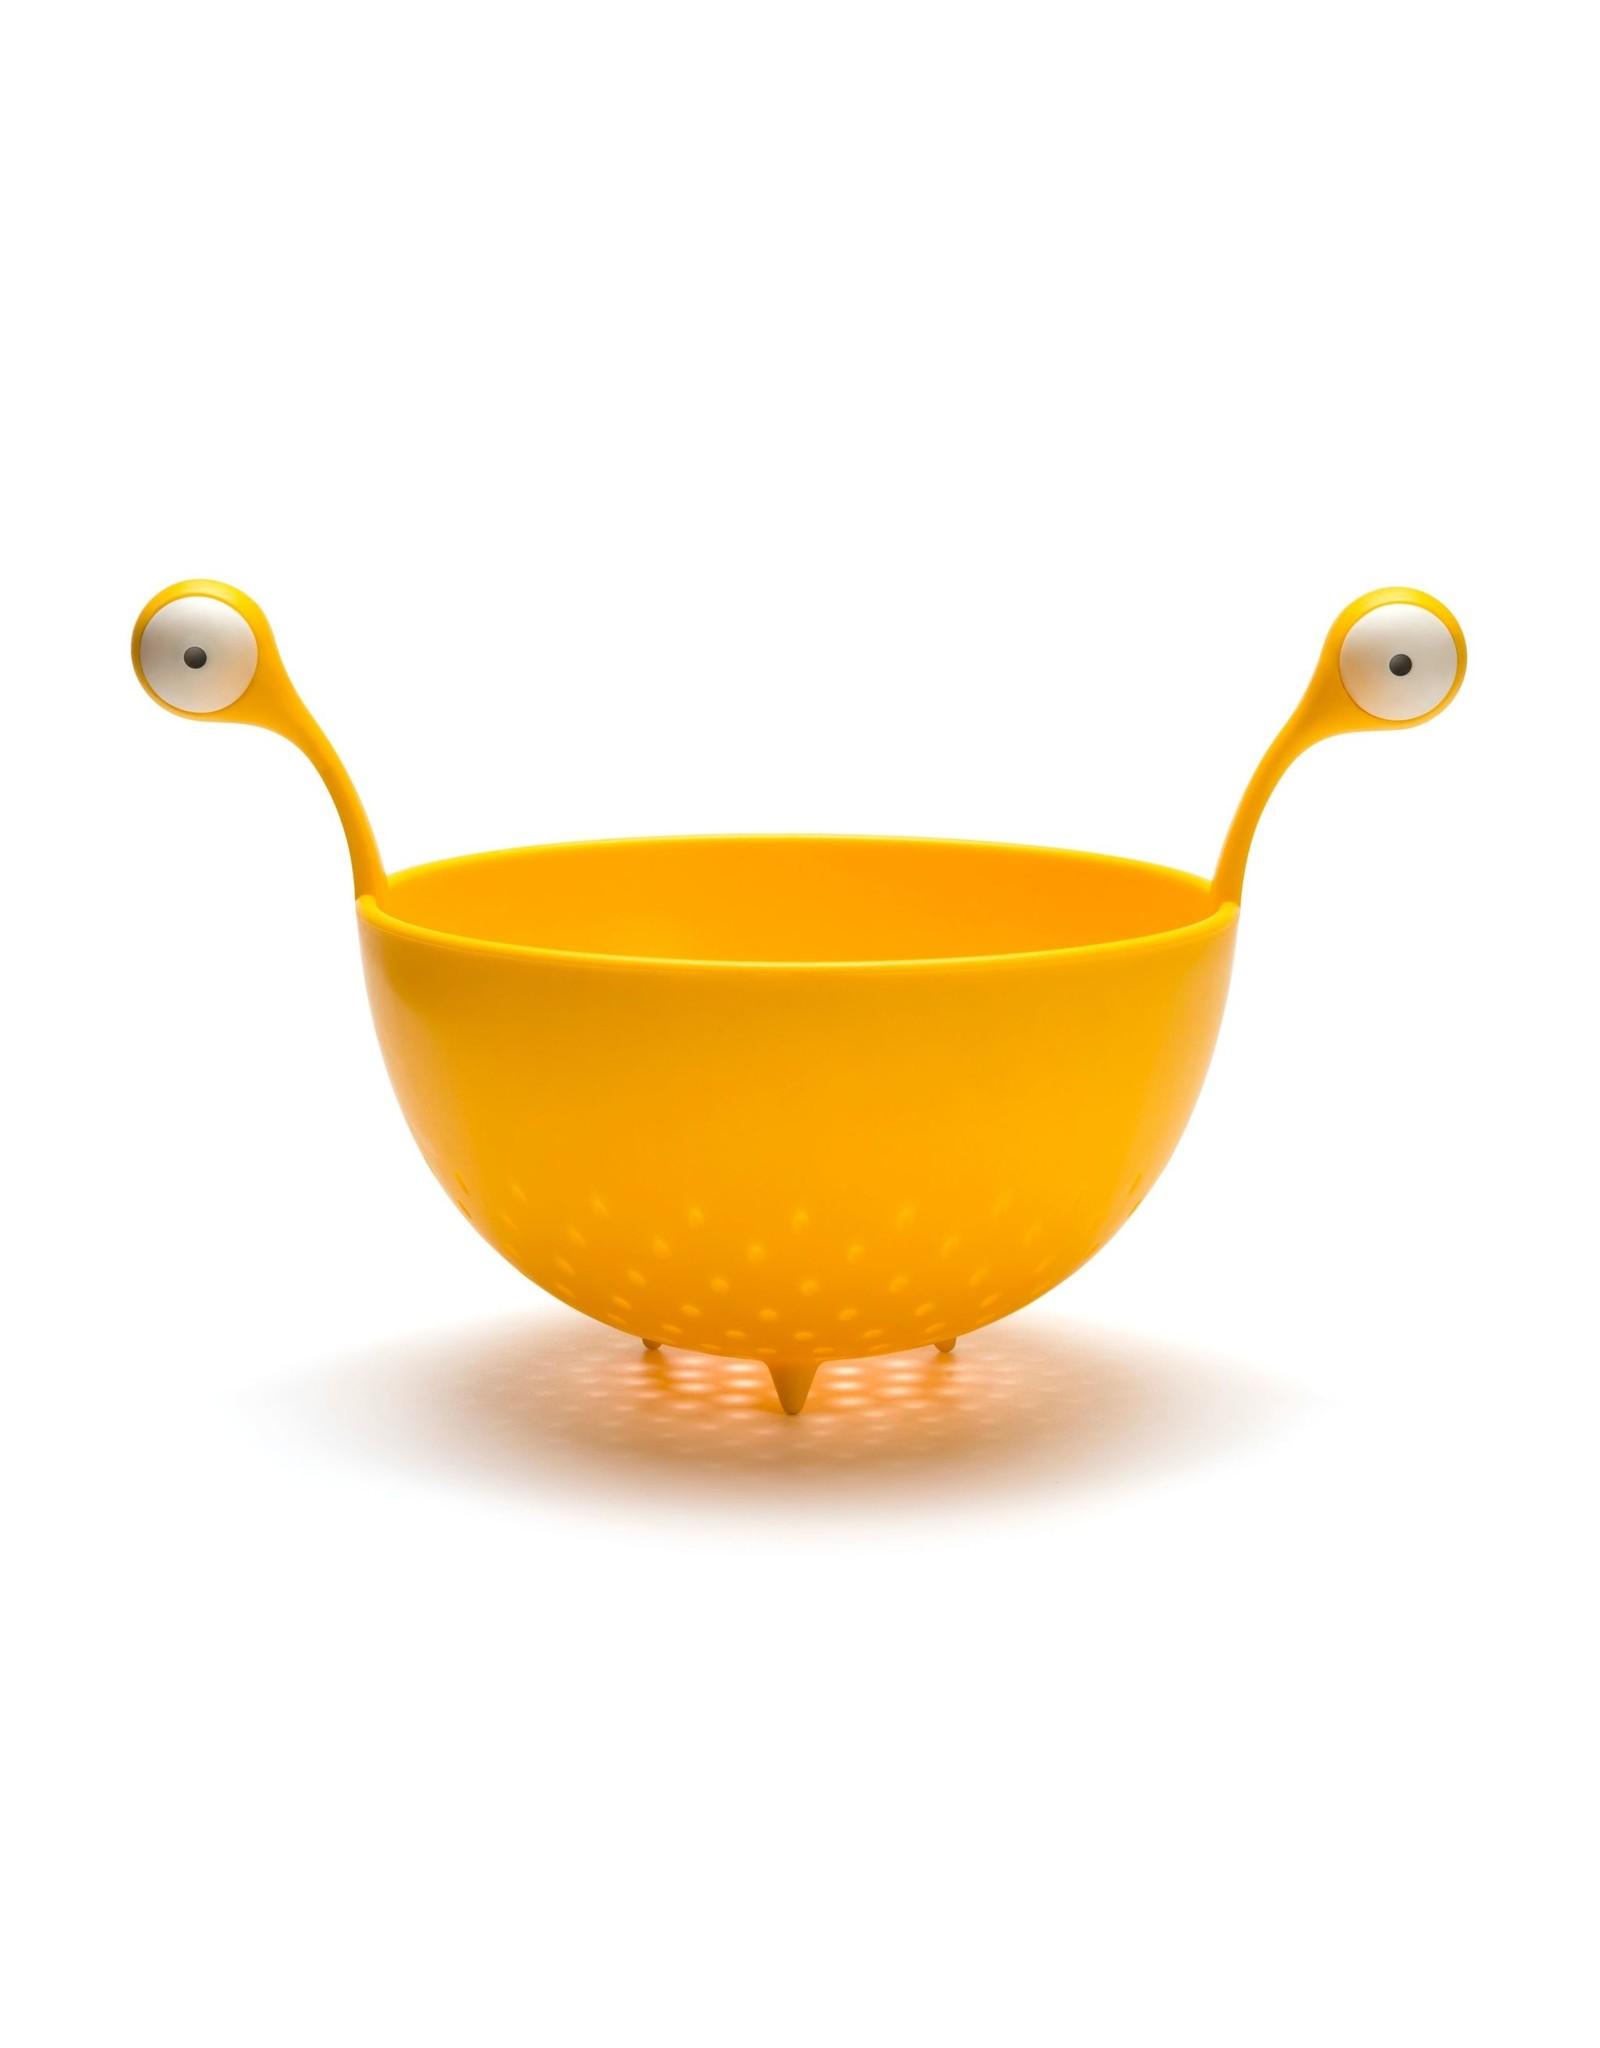 Ototo yellow colander - spaghetti monster